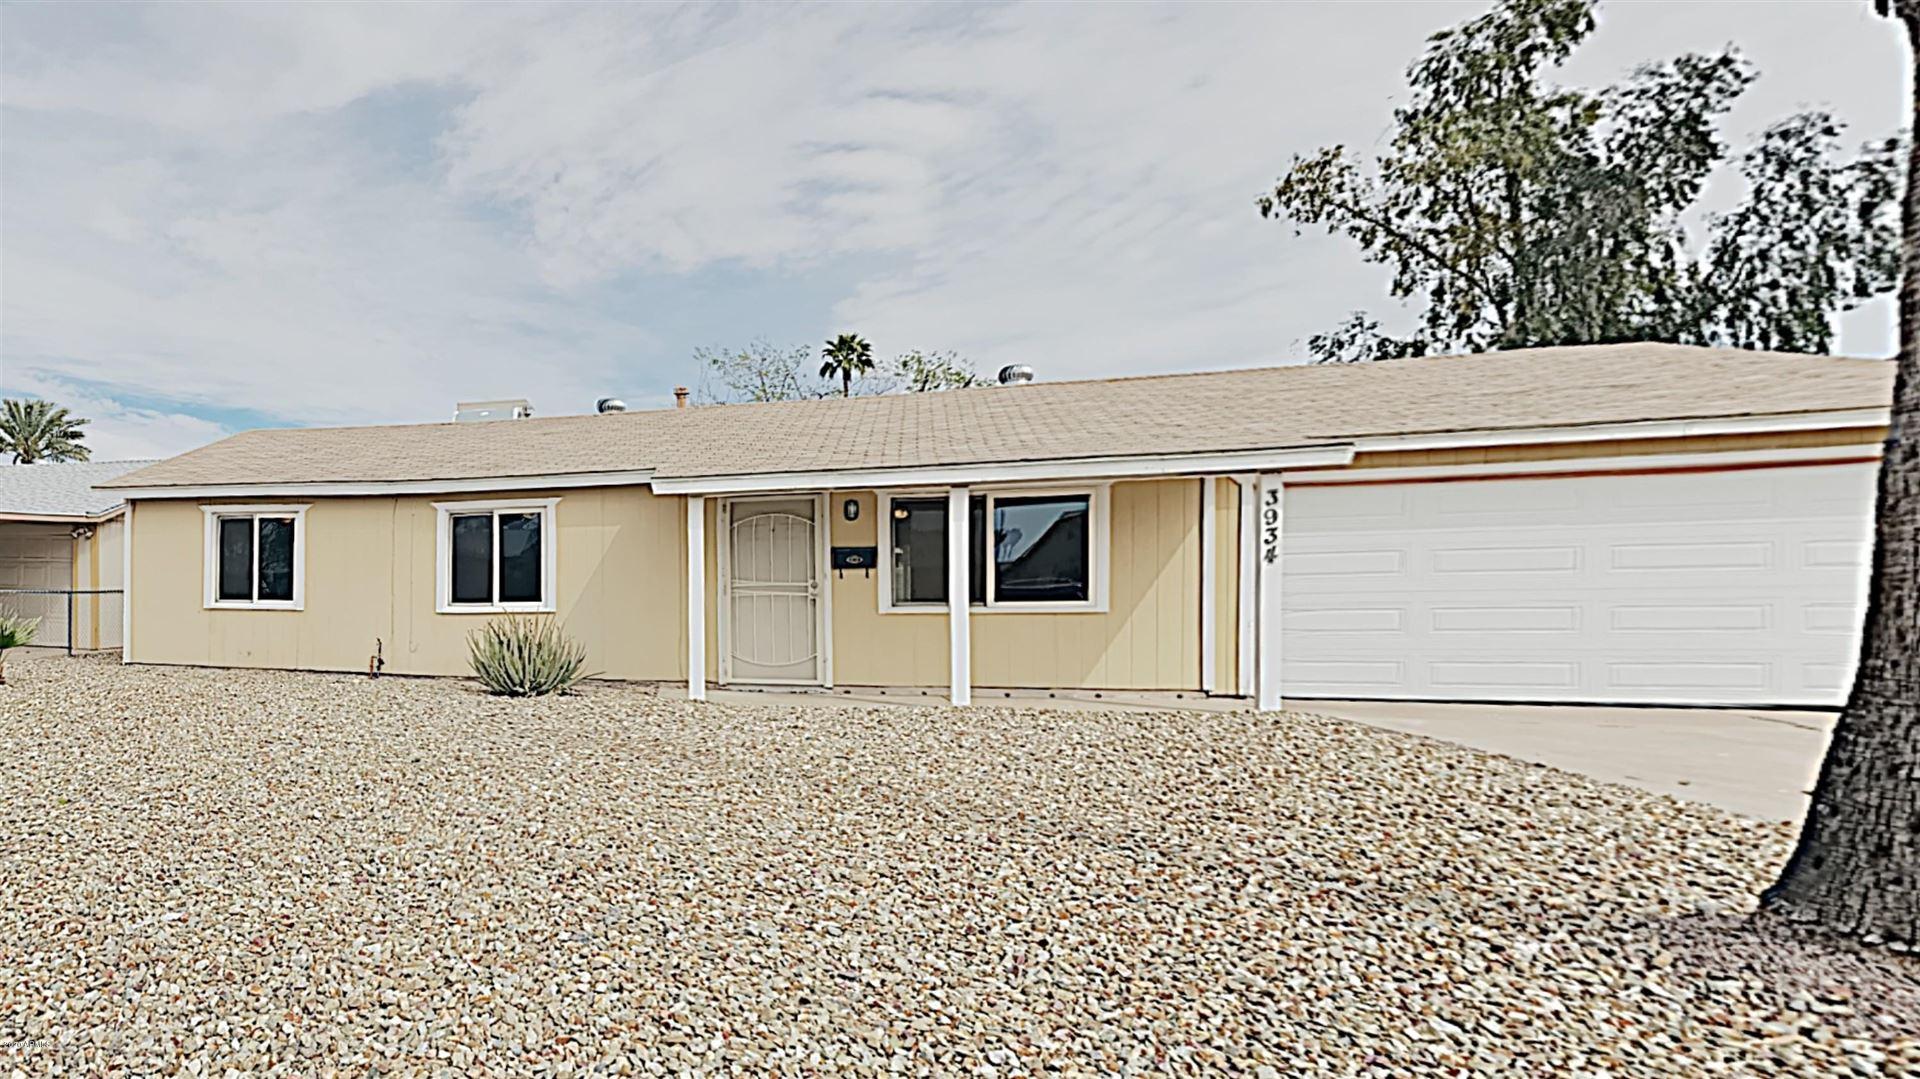 3934 E EMILE ZOLA Avenue, Phoenix, AZ 85032 - MLS#: 6057595